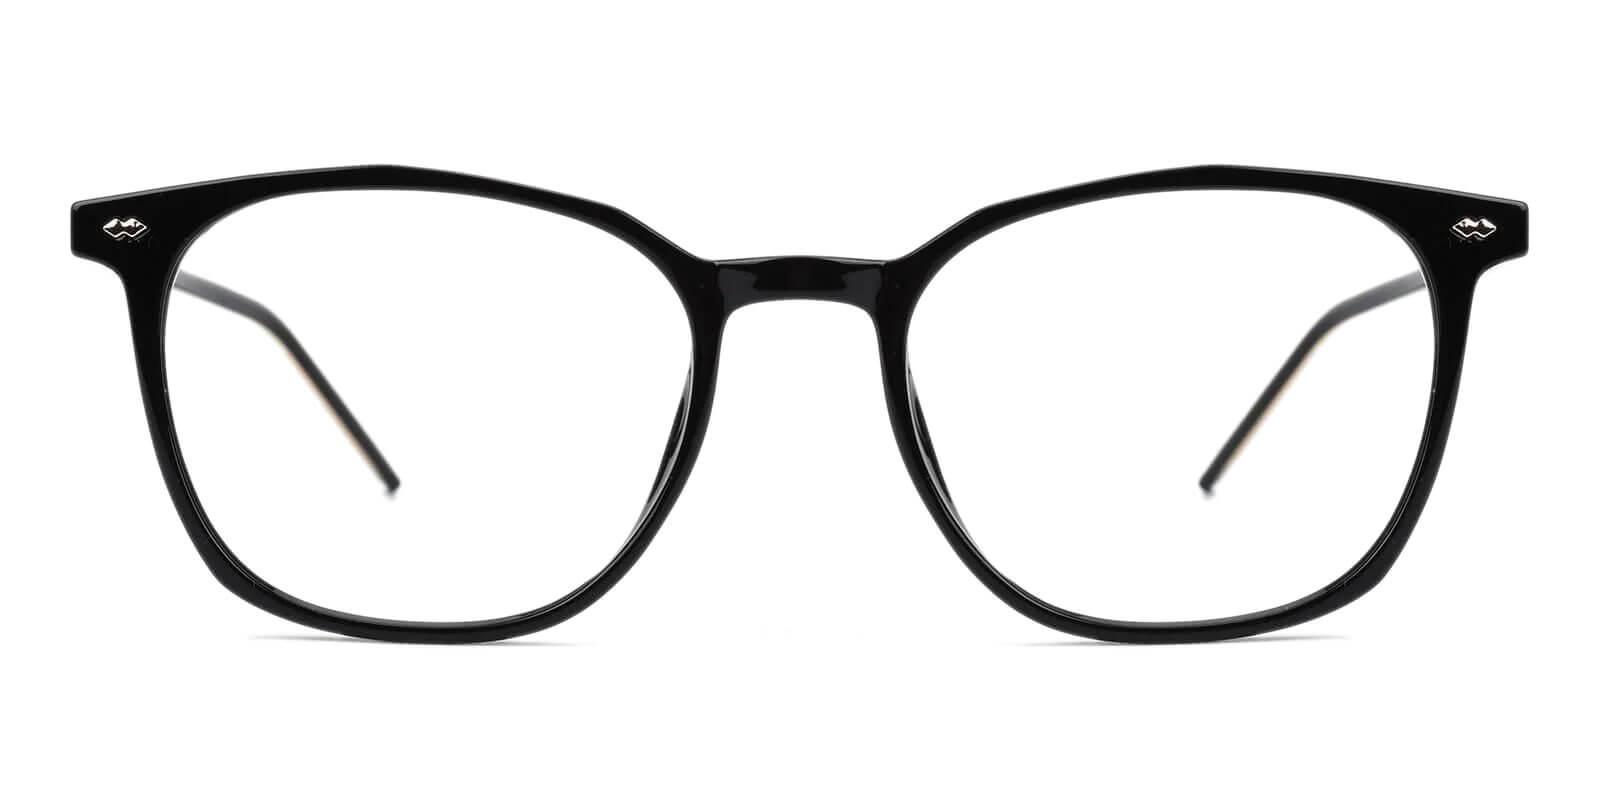 Prodigy Black Acetate Eyeglasses , SpringHinges , UniversalBridgeFit Frames from ABBE Glasses